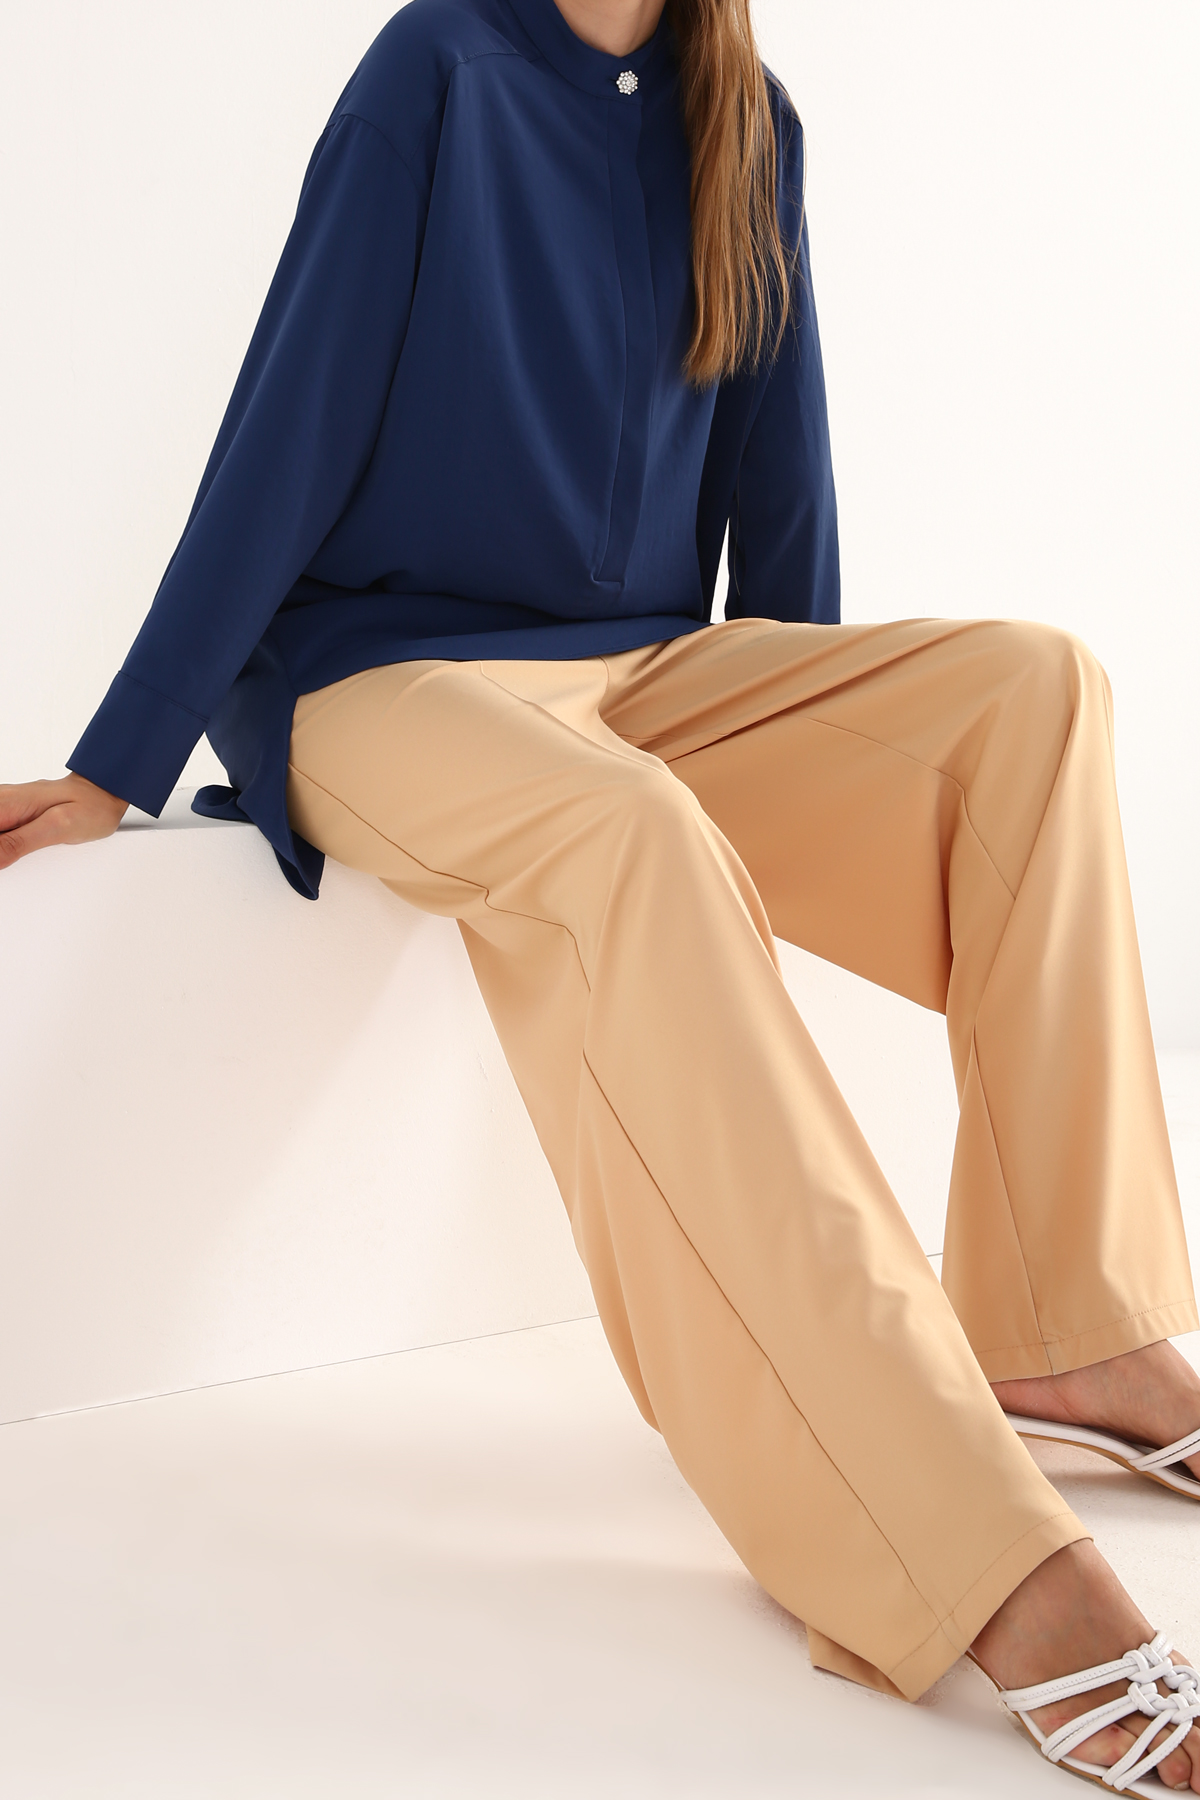 Mandarin Collar Comfy Button Detailed Tunic